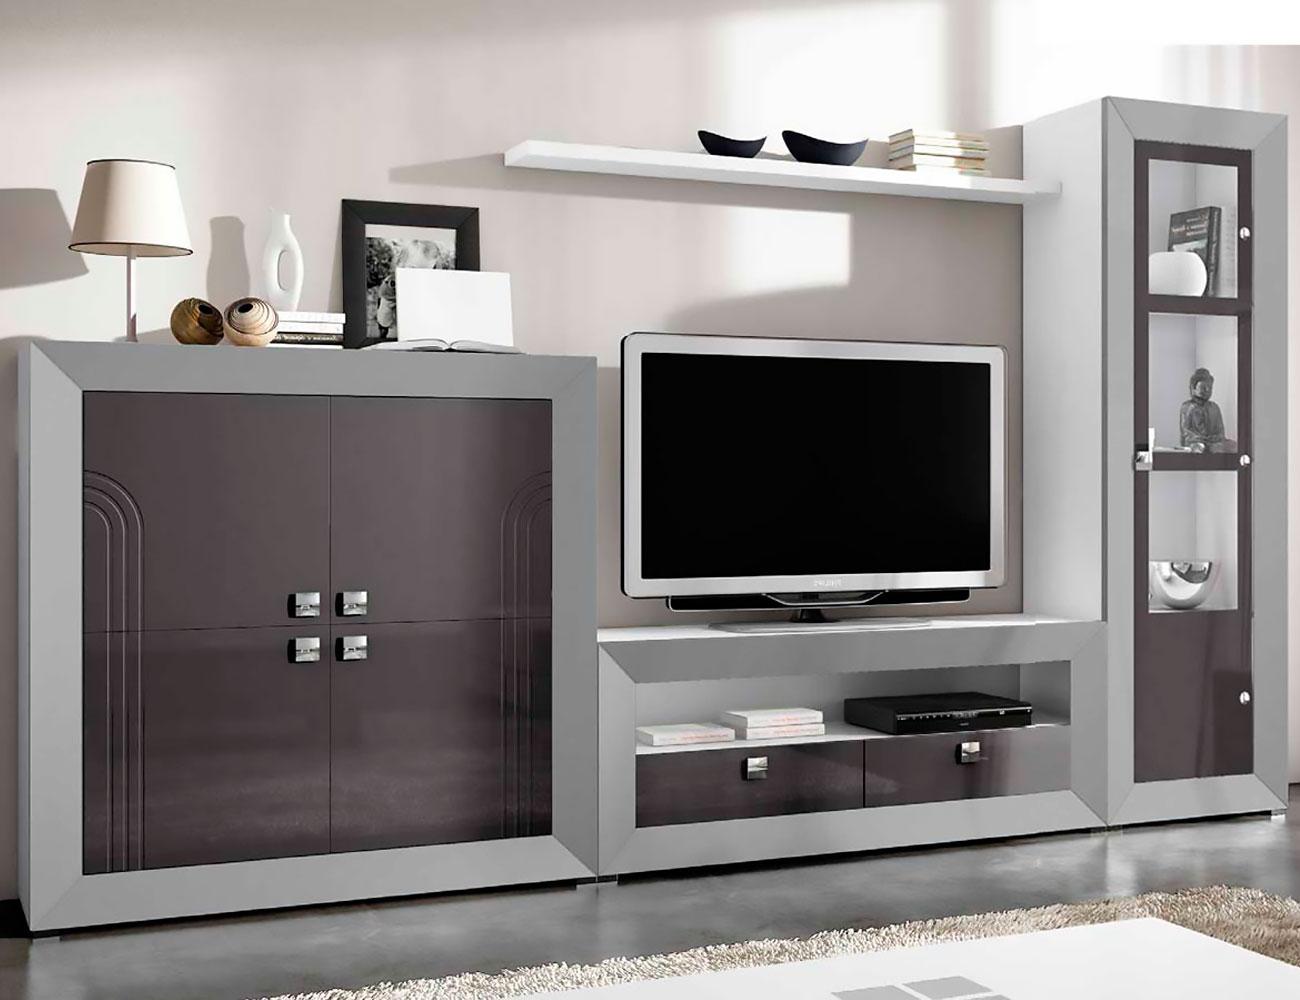 Mueble salon moderno 072